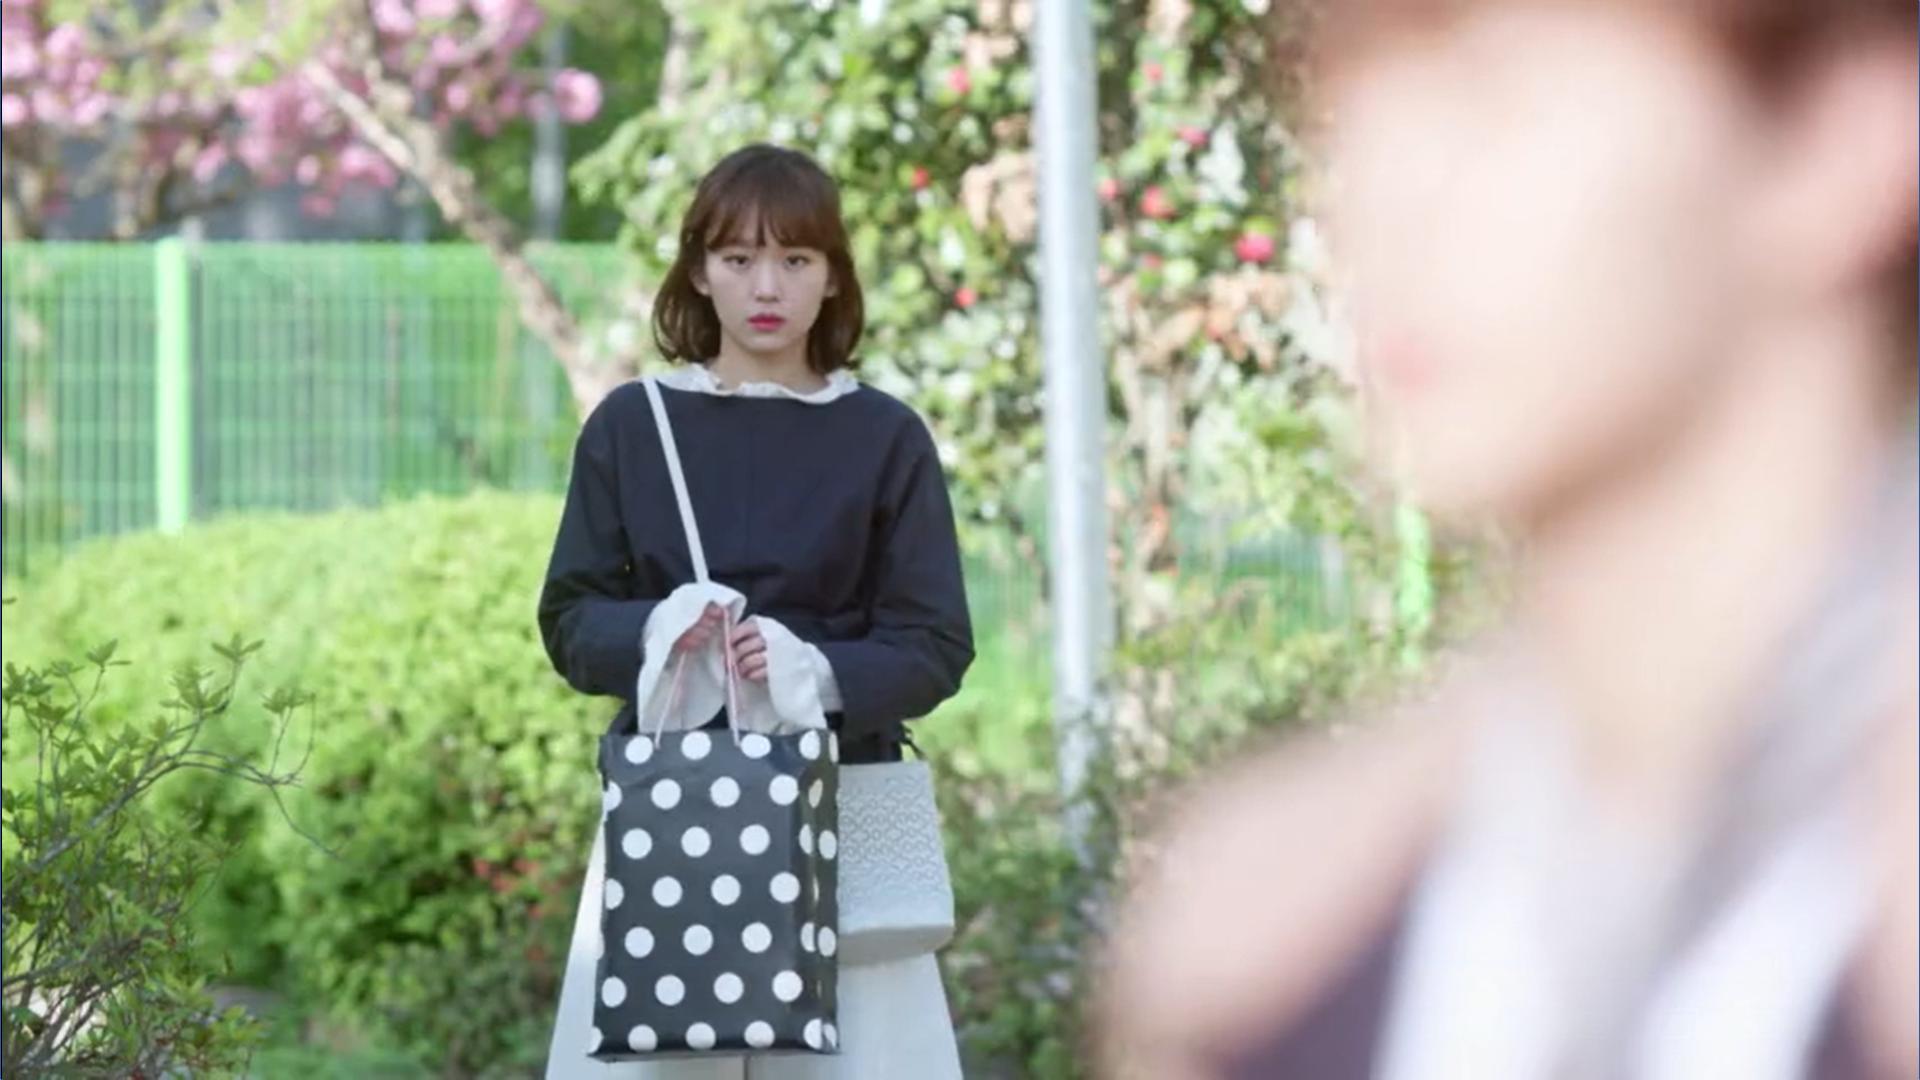 Wednesday 3:30 PM Seon Eun-woo seeing Yoon Jae-won and Gong Na-yeon together